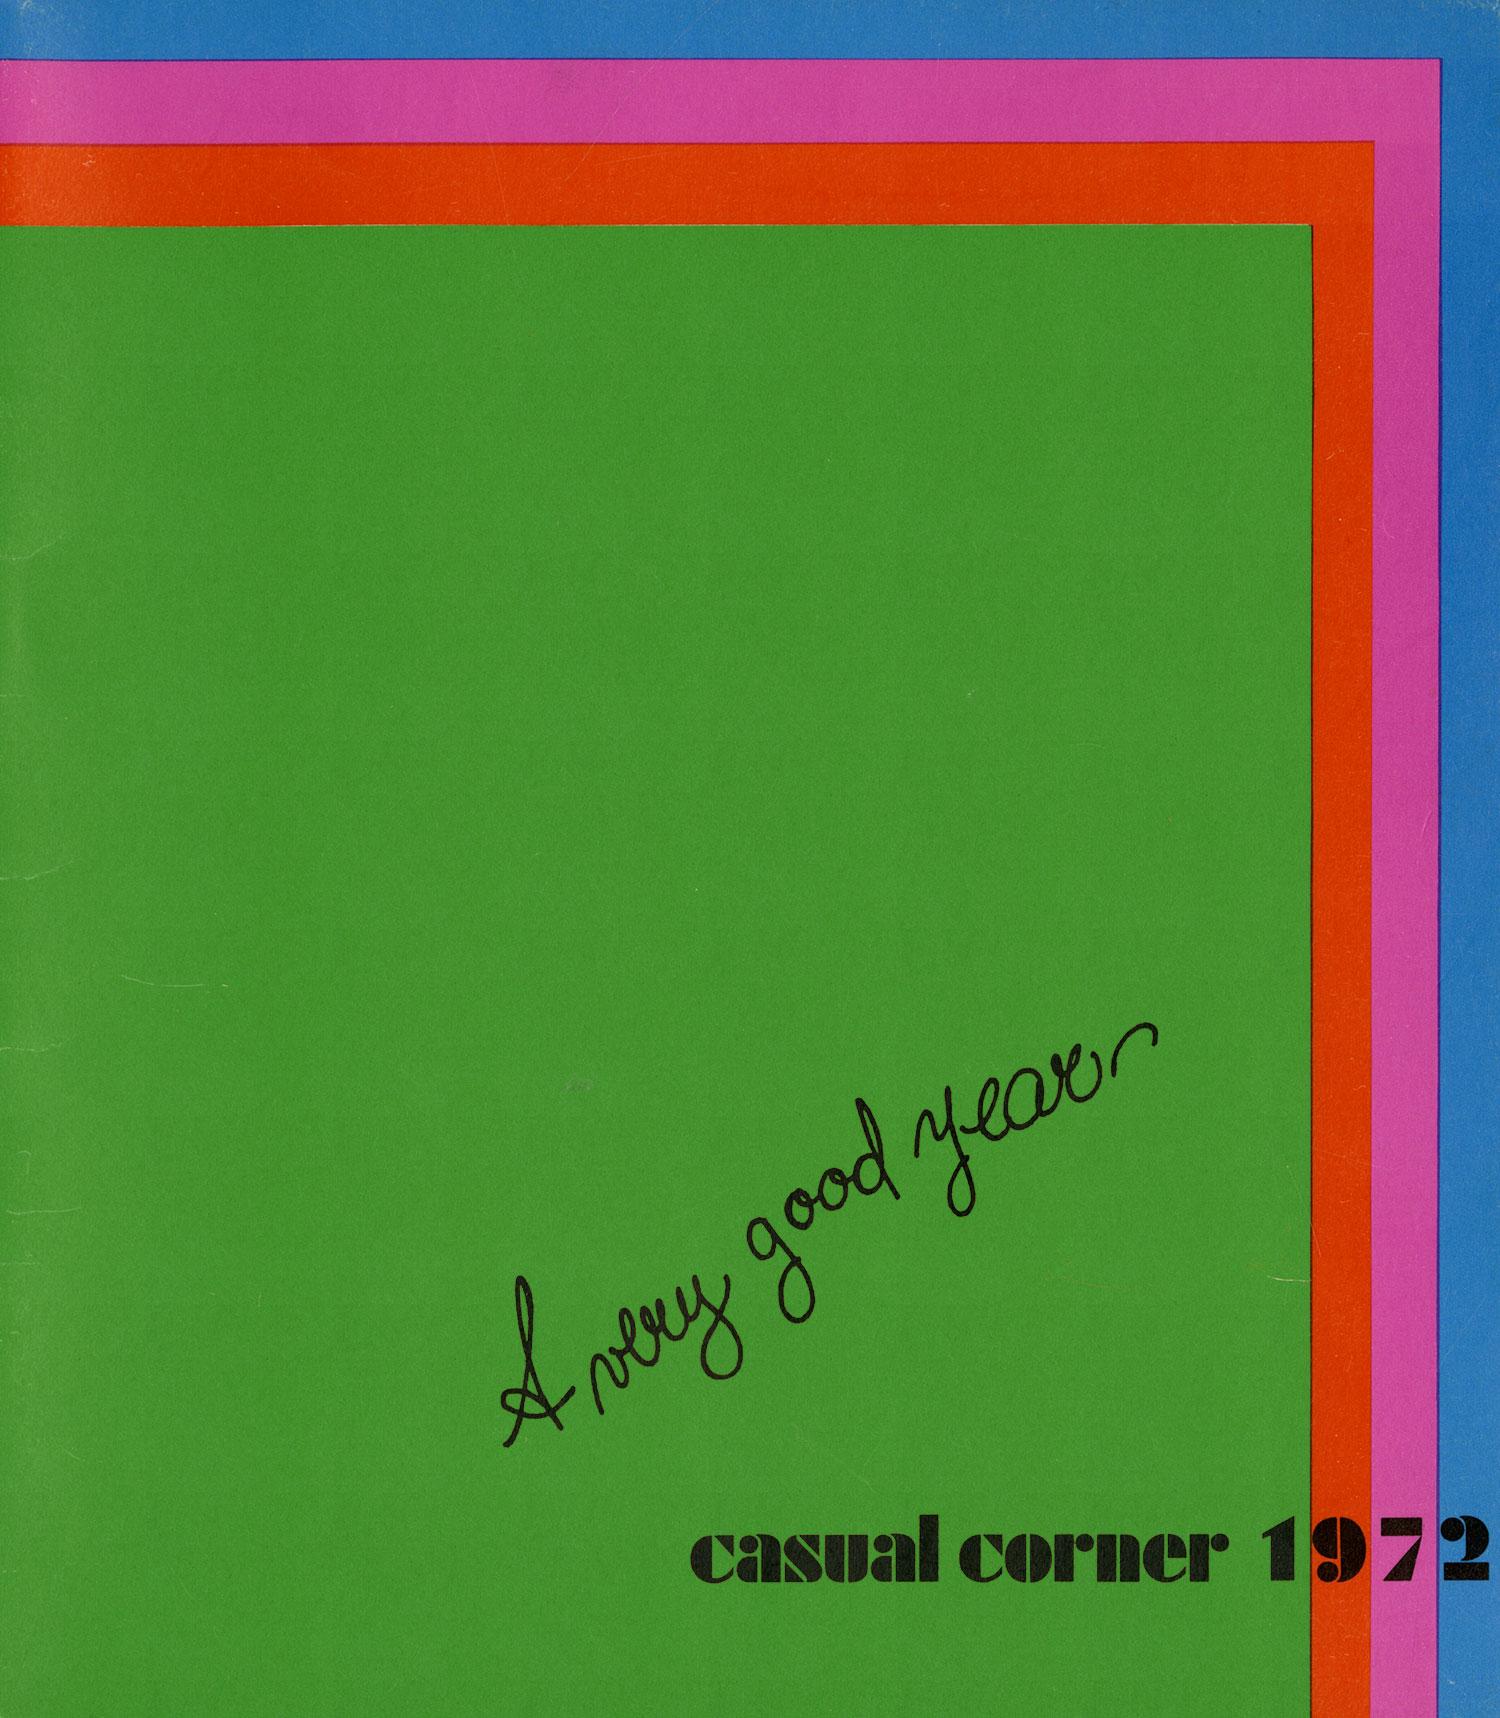 casual-corner-calendar-right-c.jpg